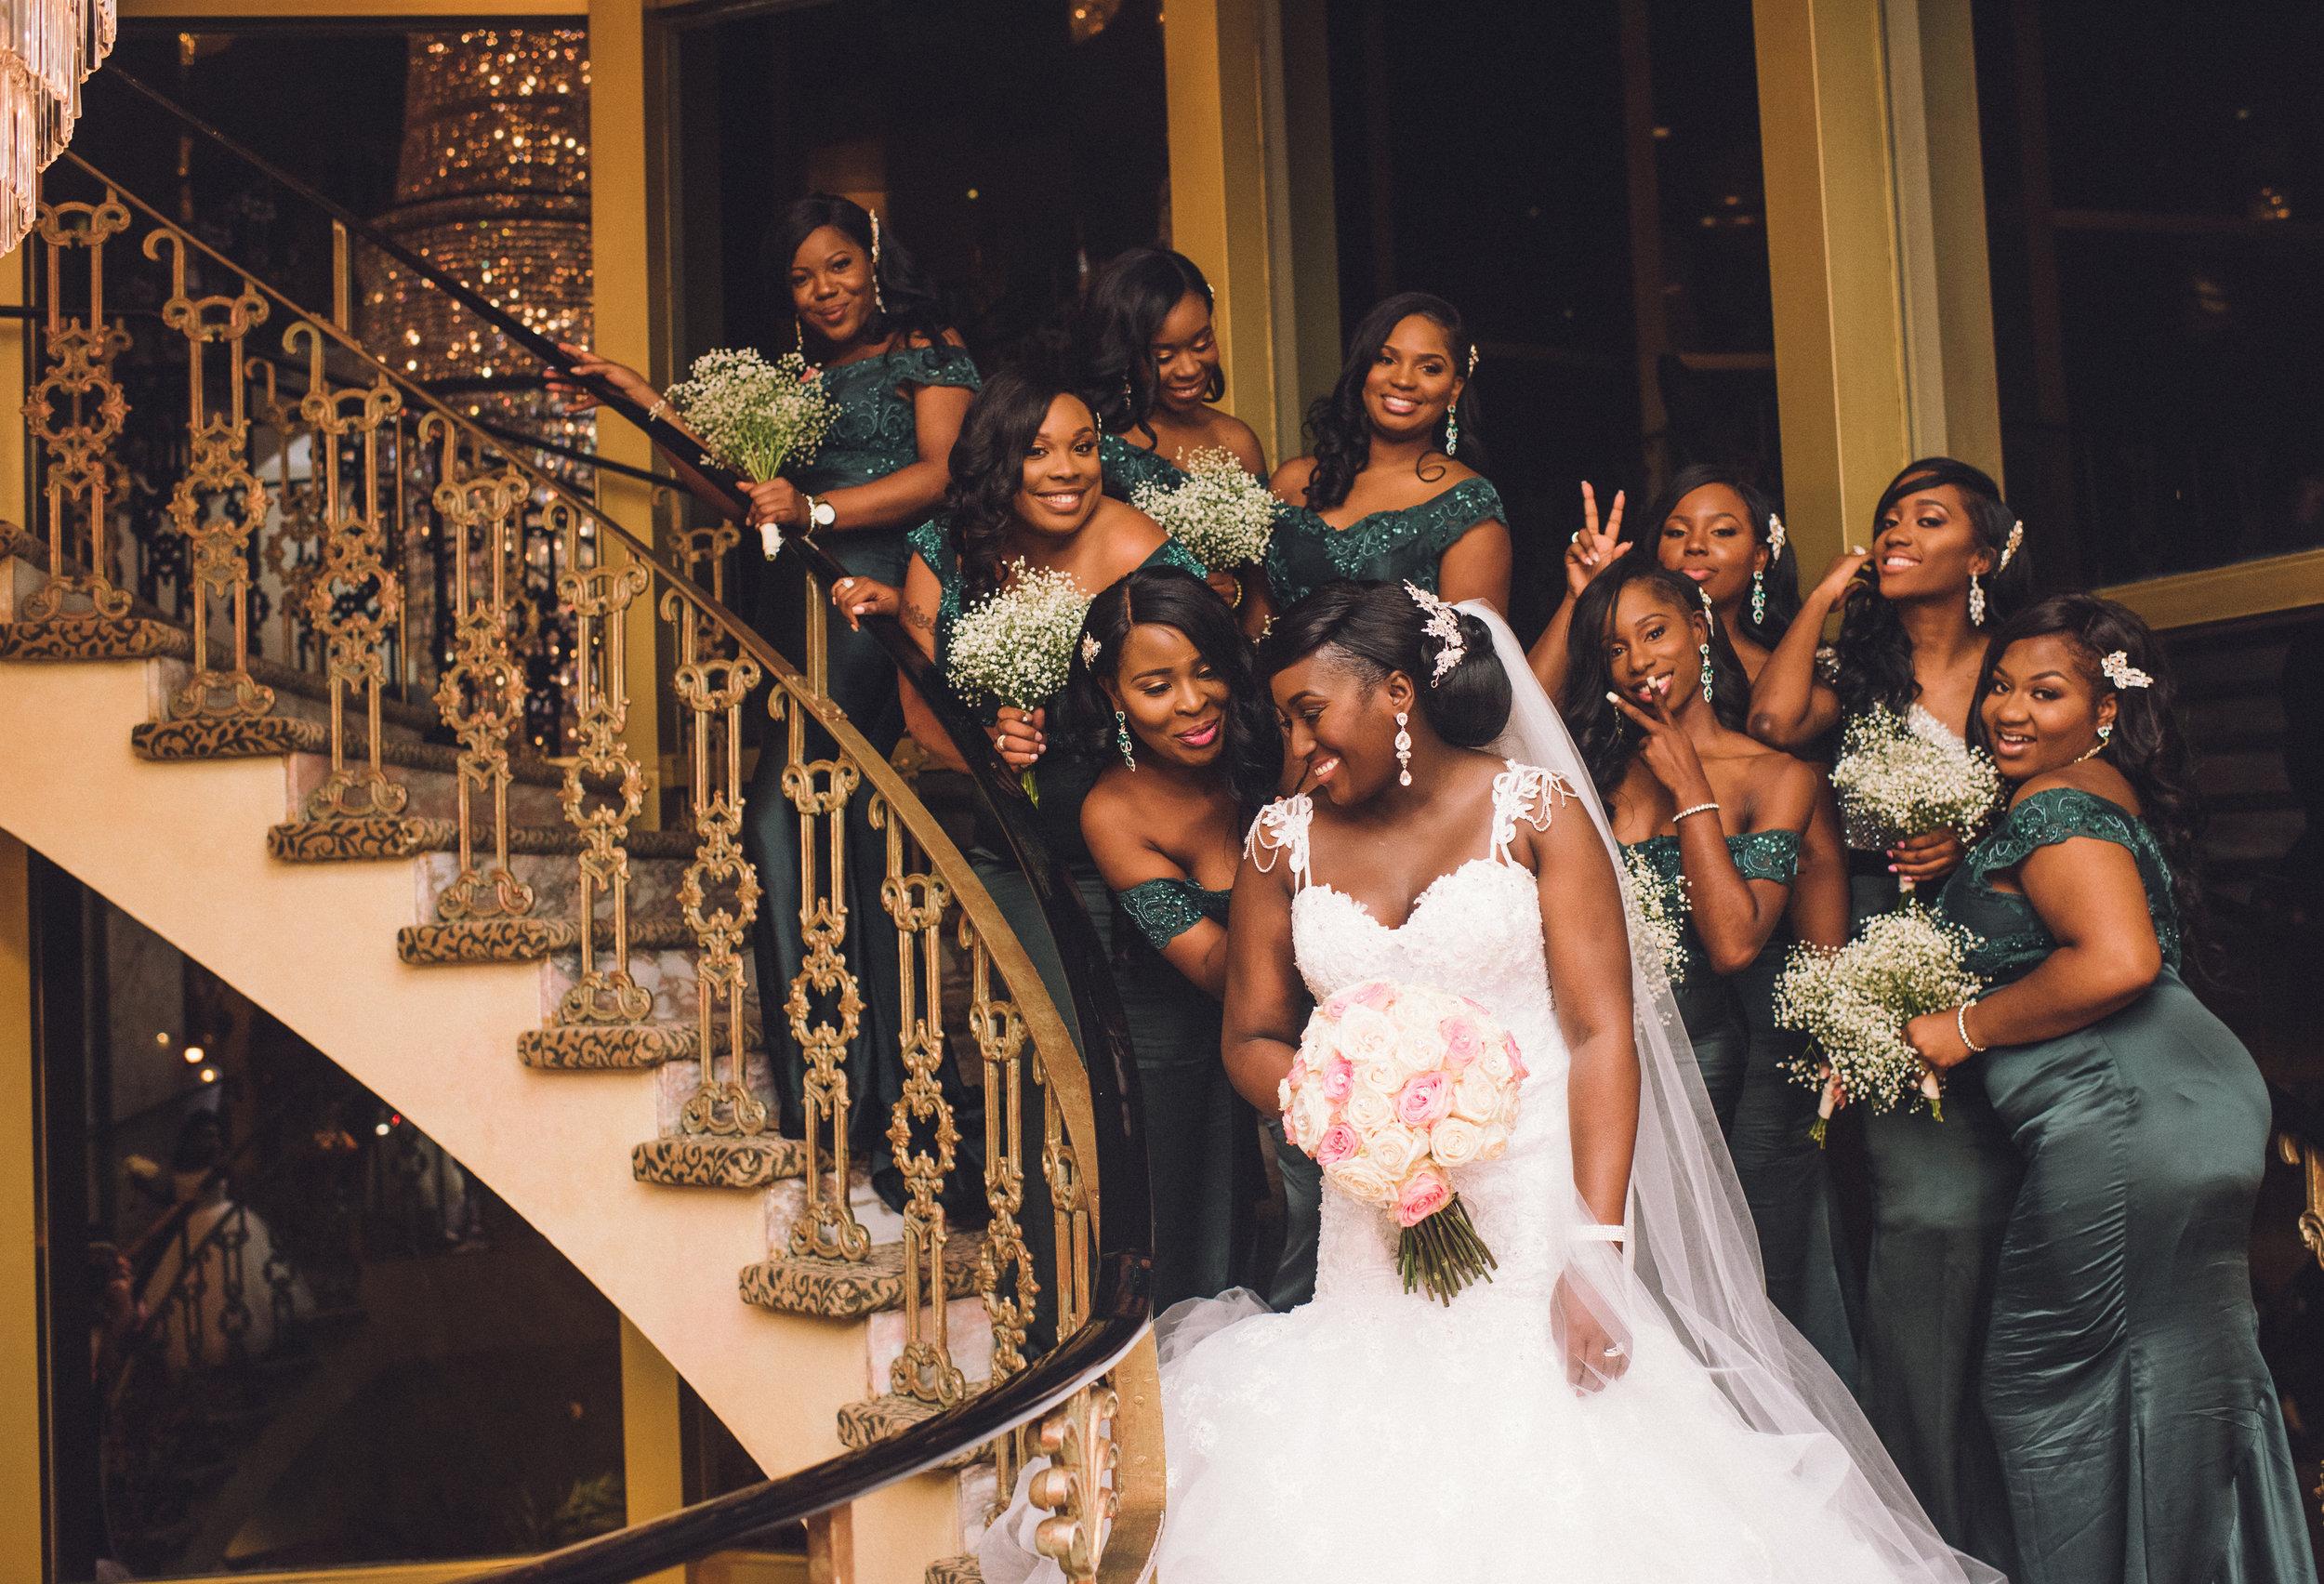 NEW YORK WEDDING PHOTOGRAPHER - TWOTWENTY by CHI-CHI AGBIM-20.jpg